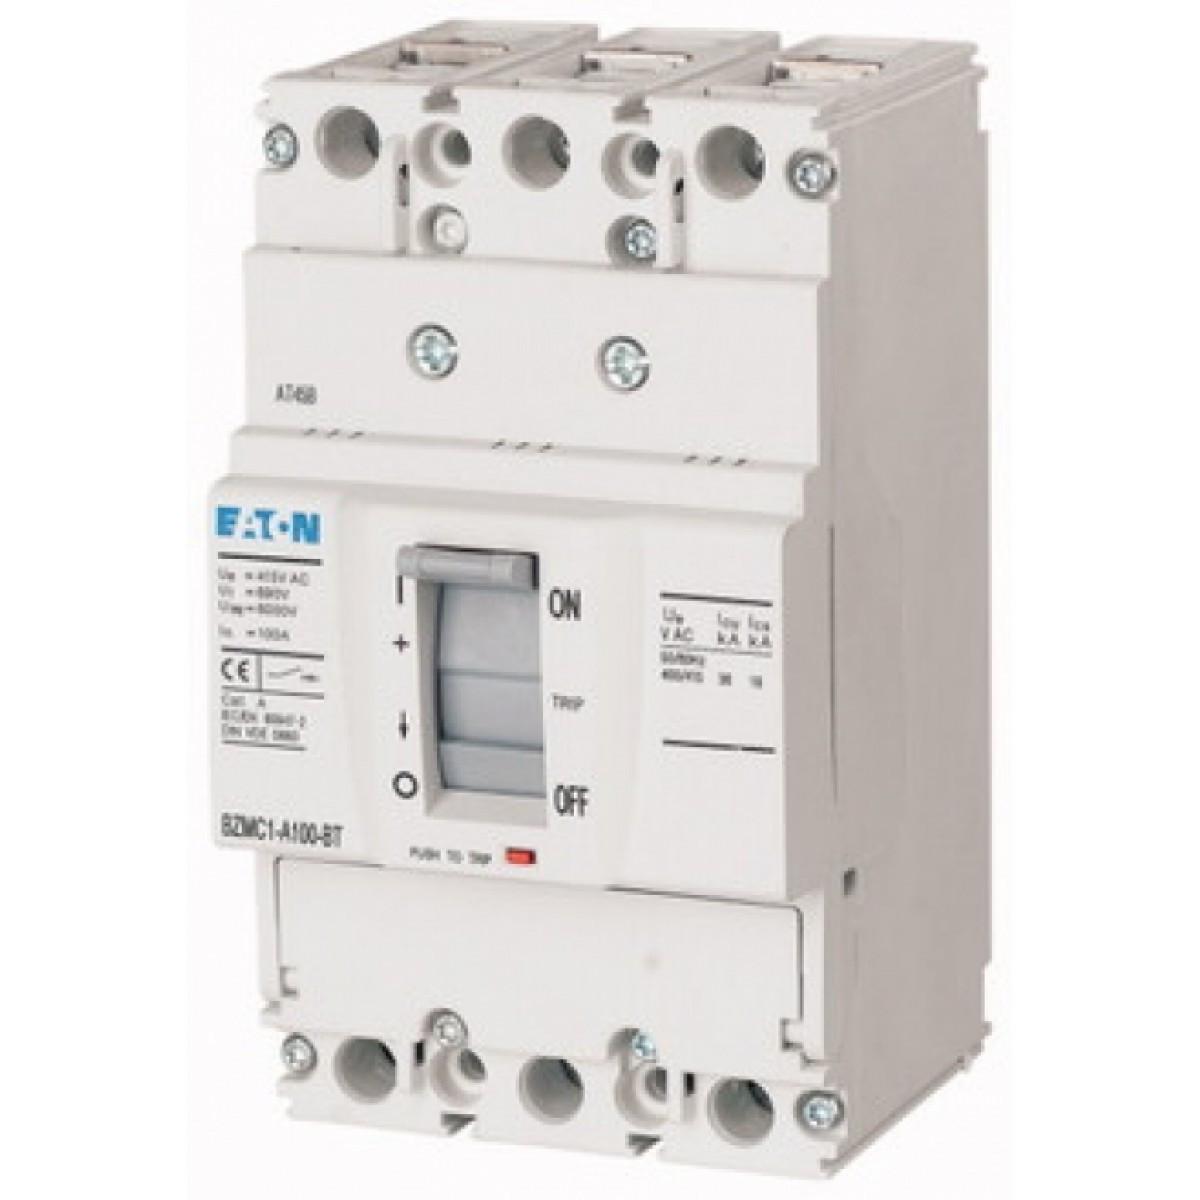 Вимикач автоматичний BZMB1-A50-BT (50А 25кА) Eaton (109750)